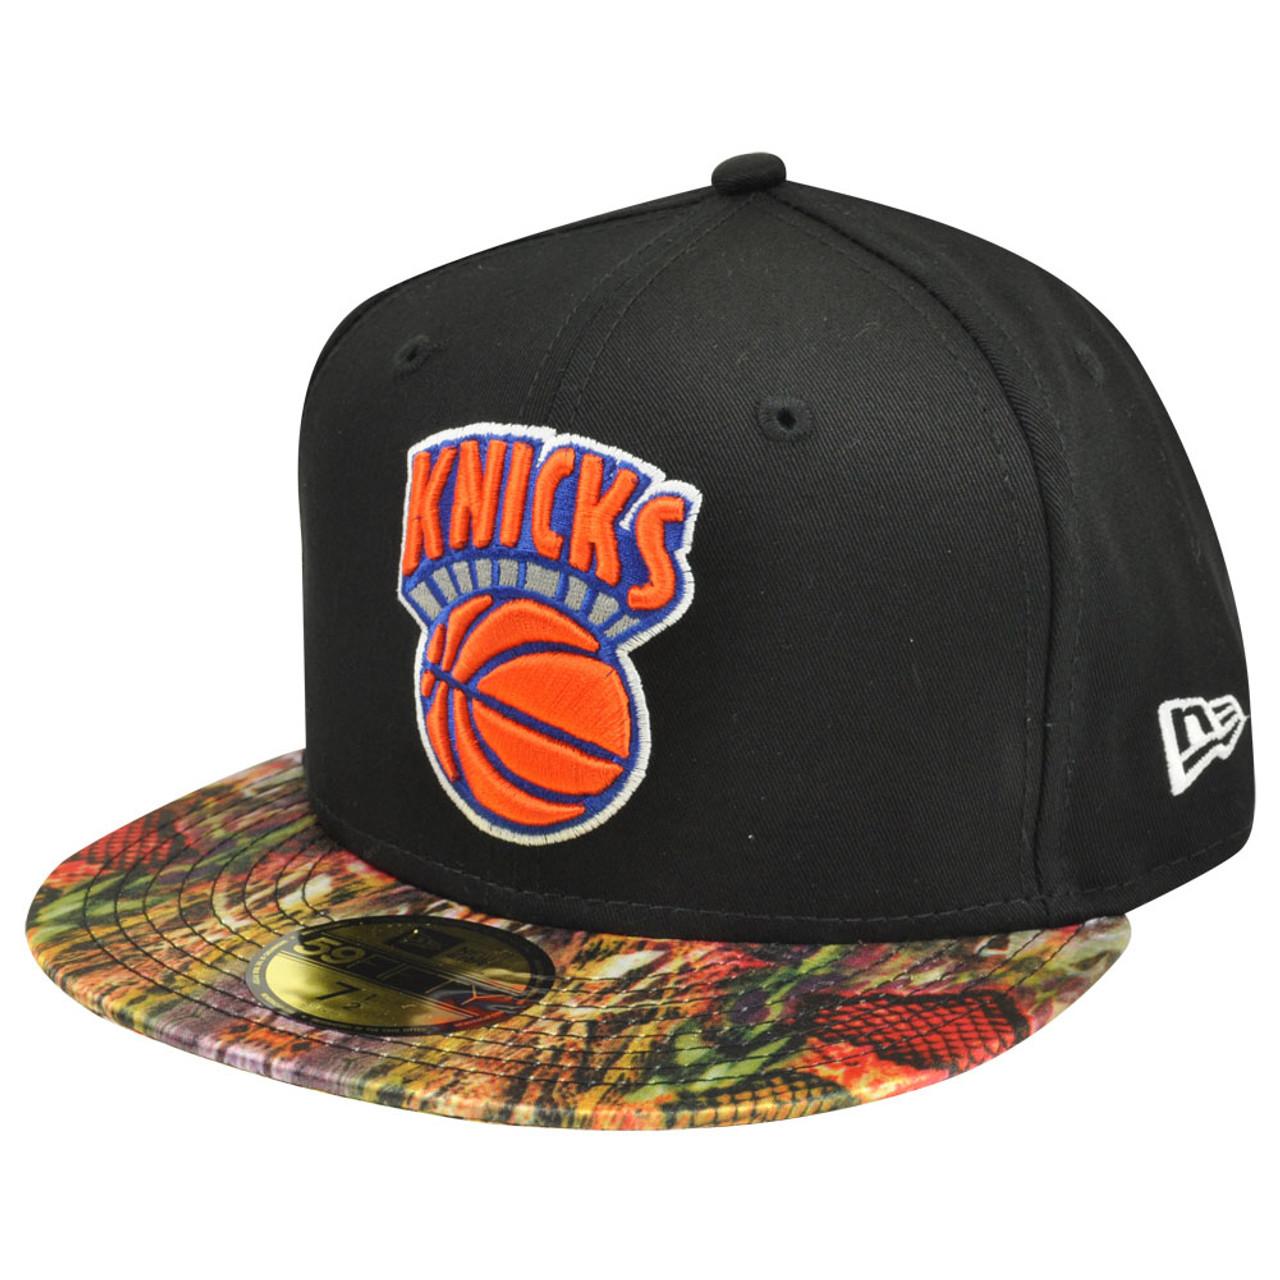 dd93000e NBA HWC New Era 59Fifty 5950 NY New York Knicks Snake Visor Fitted Hat Cap  - Cap Store Online.com